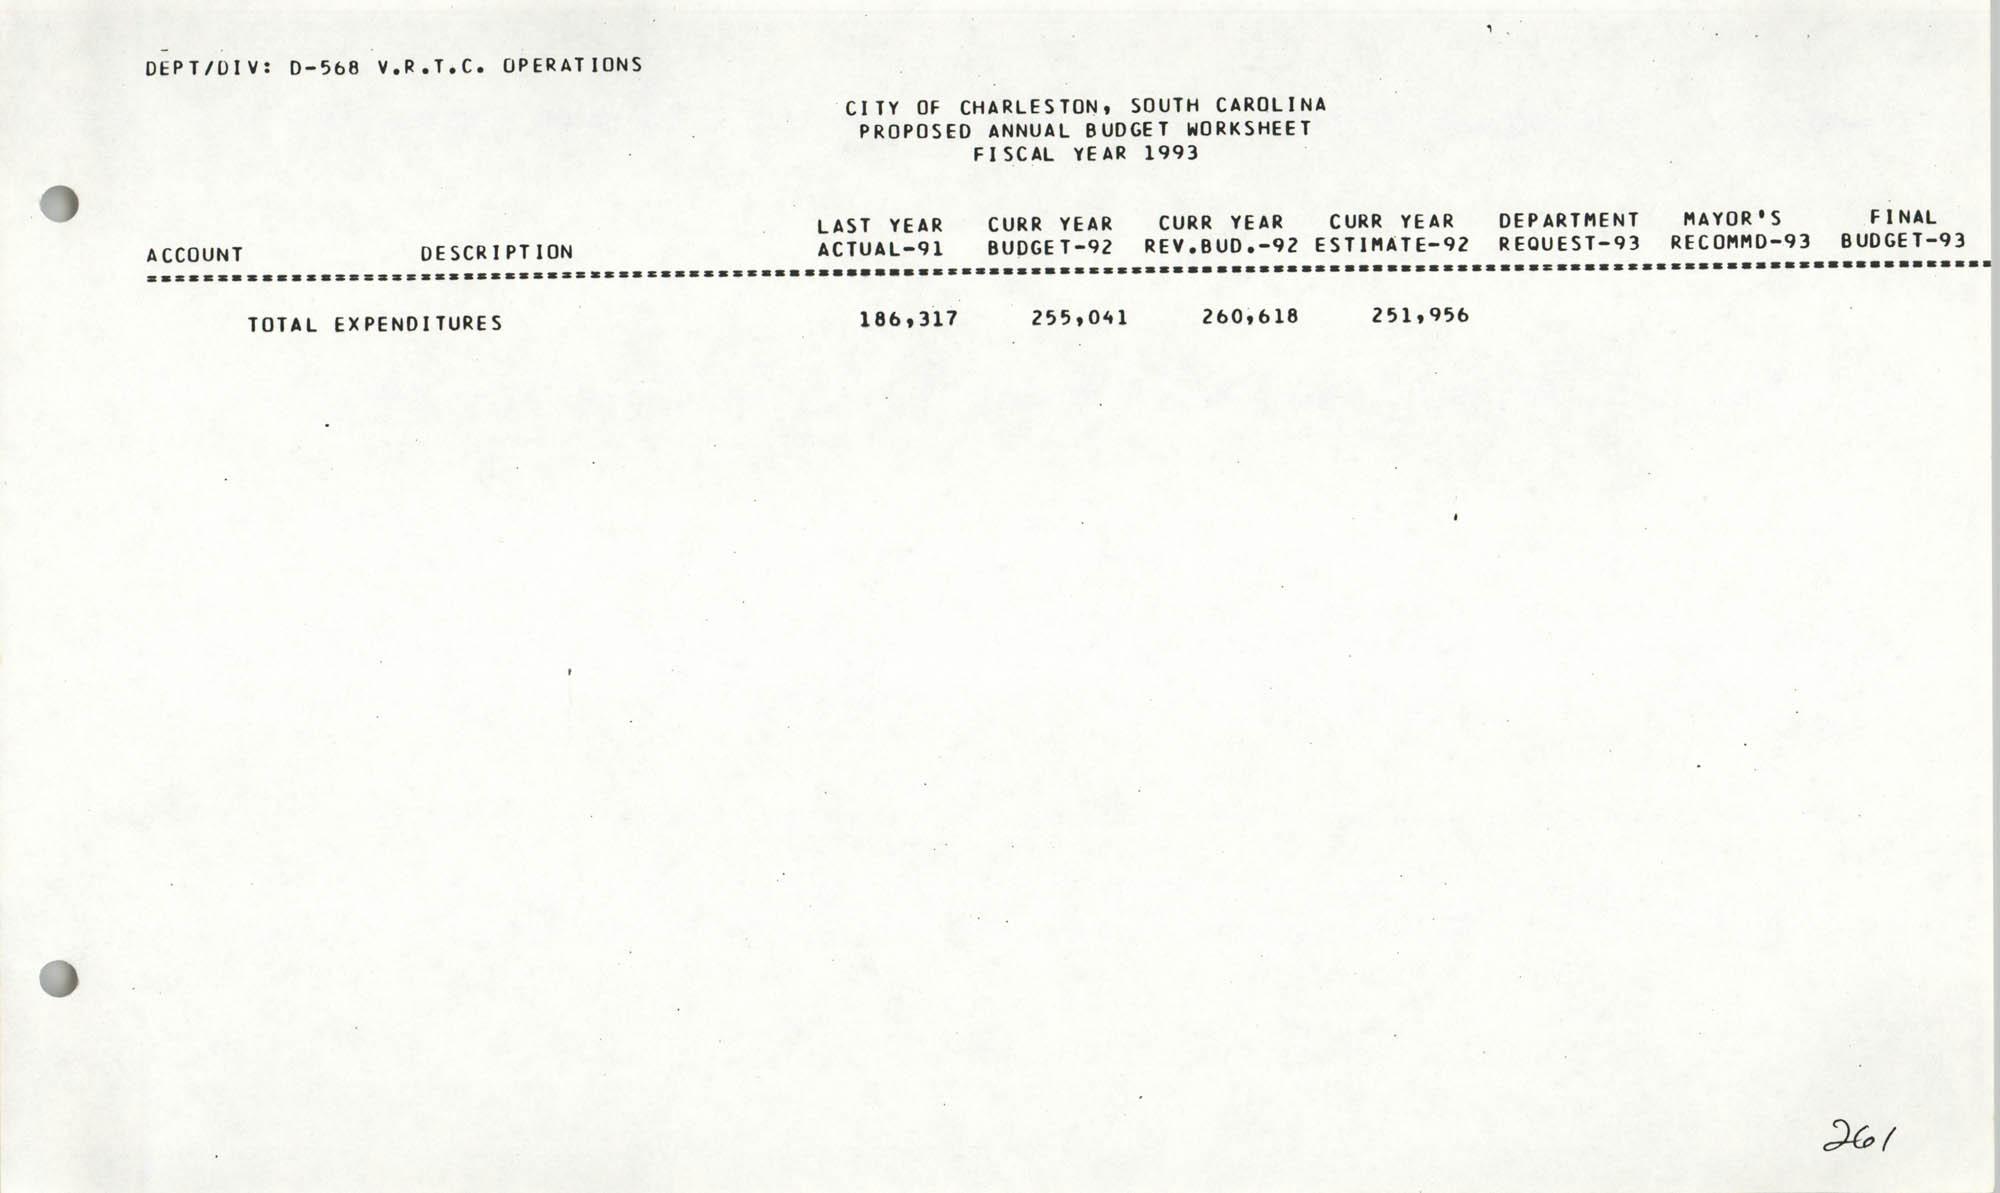 The City Council of Charleston, South Carolina, 1993 Budget, Page 261